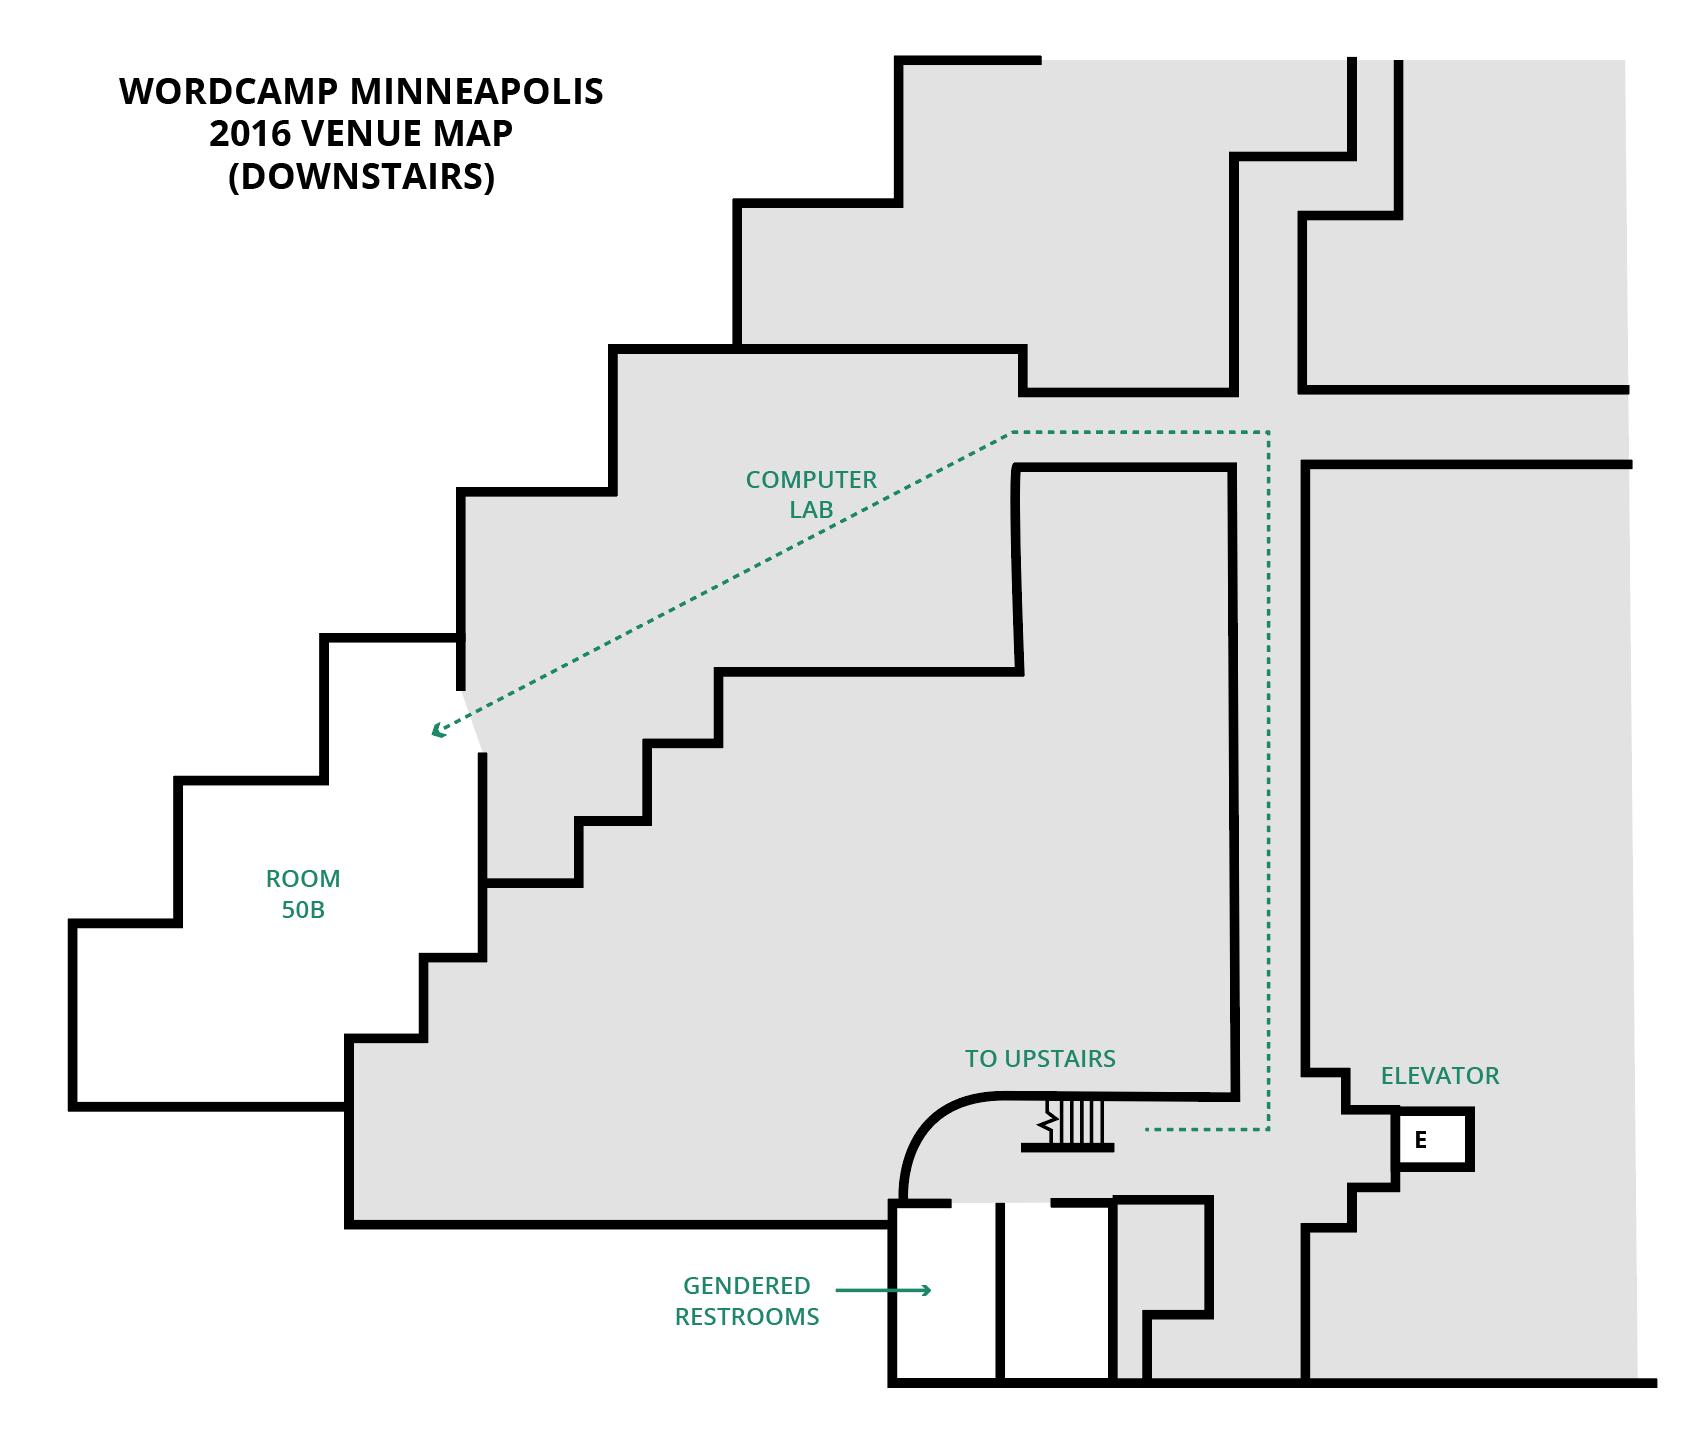 Venue Downstairs